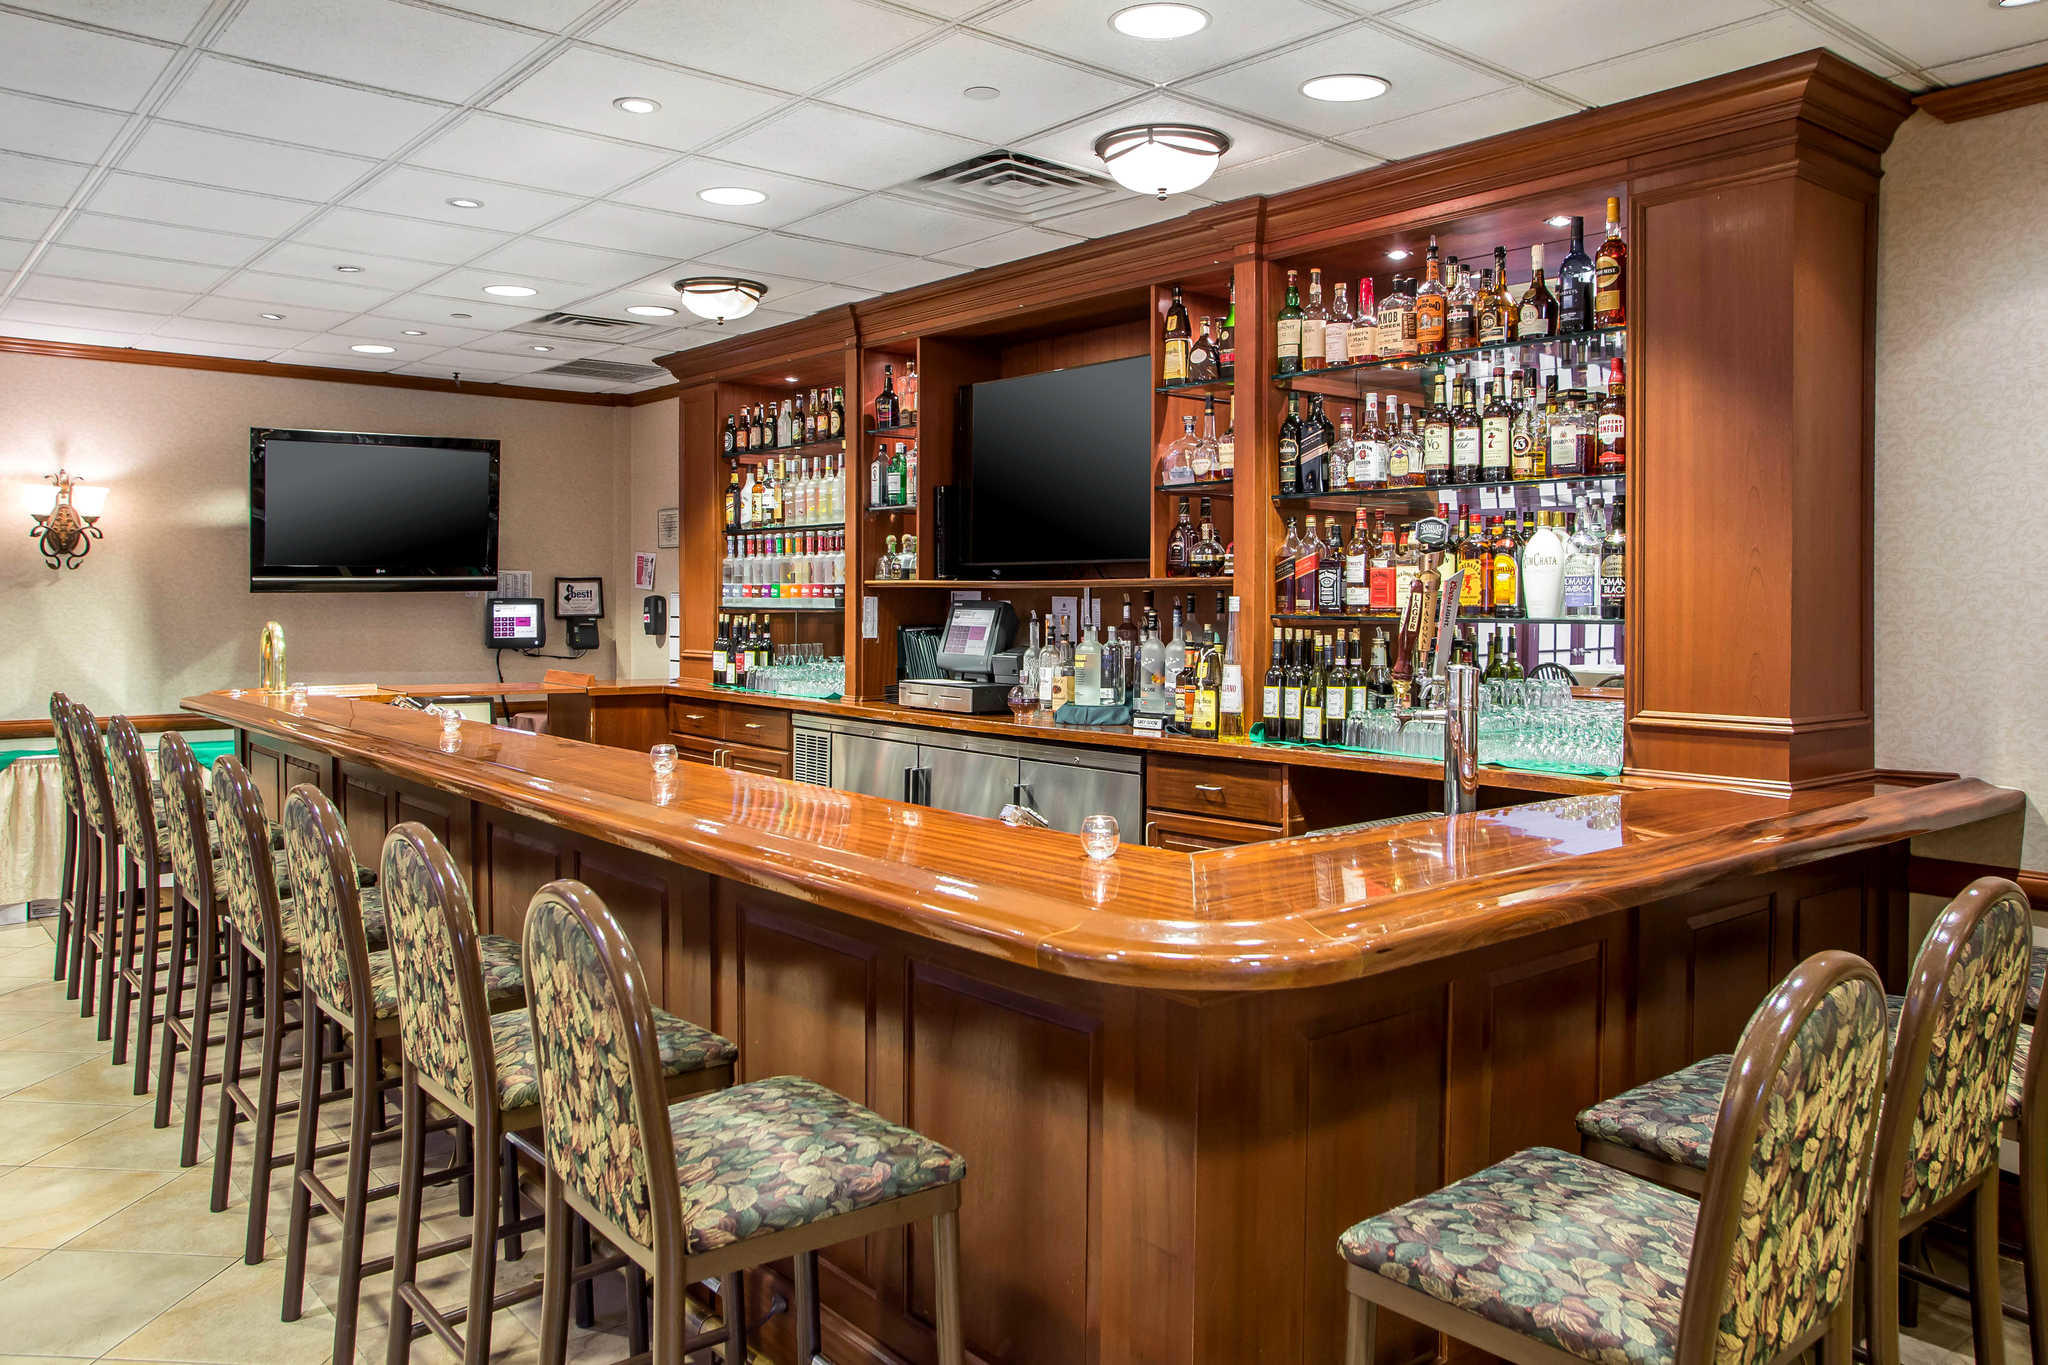 clarion hotel conference center 815 route 37 west. Black Bedroom Furniture Sets. Home Design Ideas